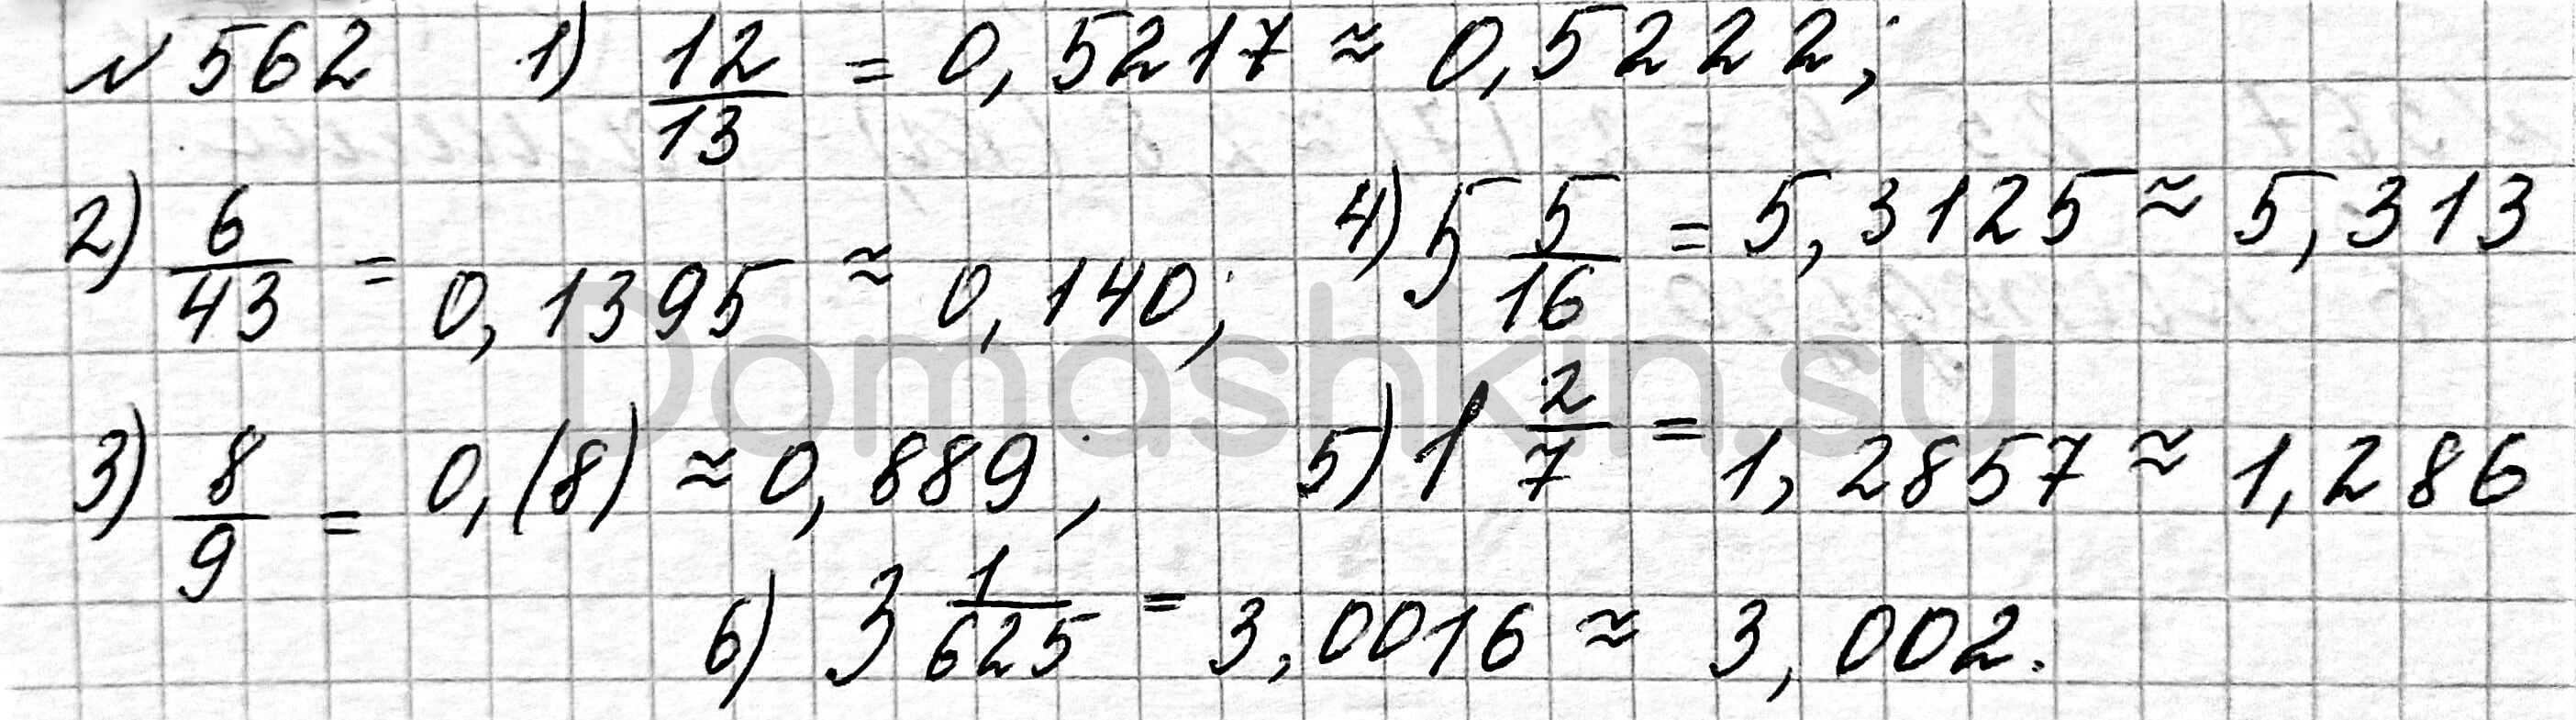 Математика 6 класс учебник Мерзляк номер 562 решение